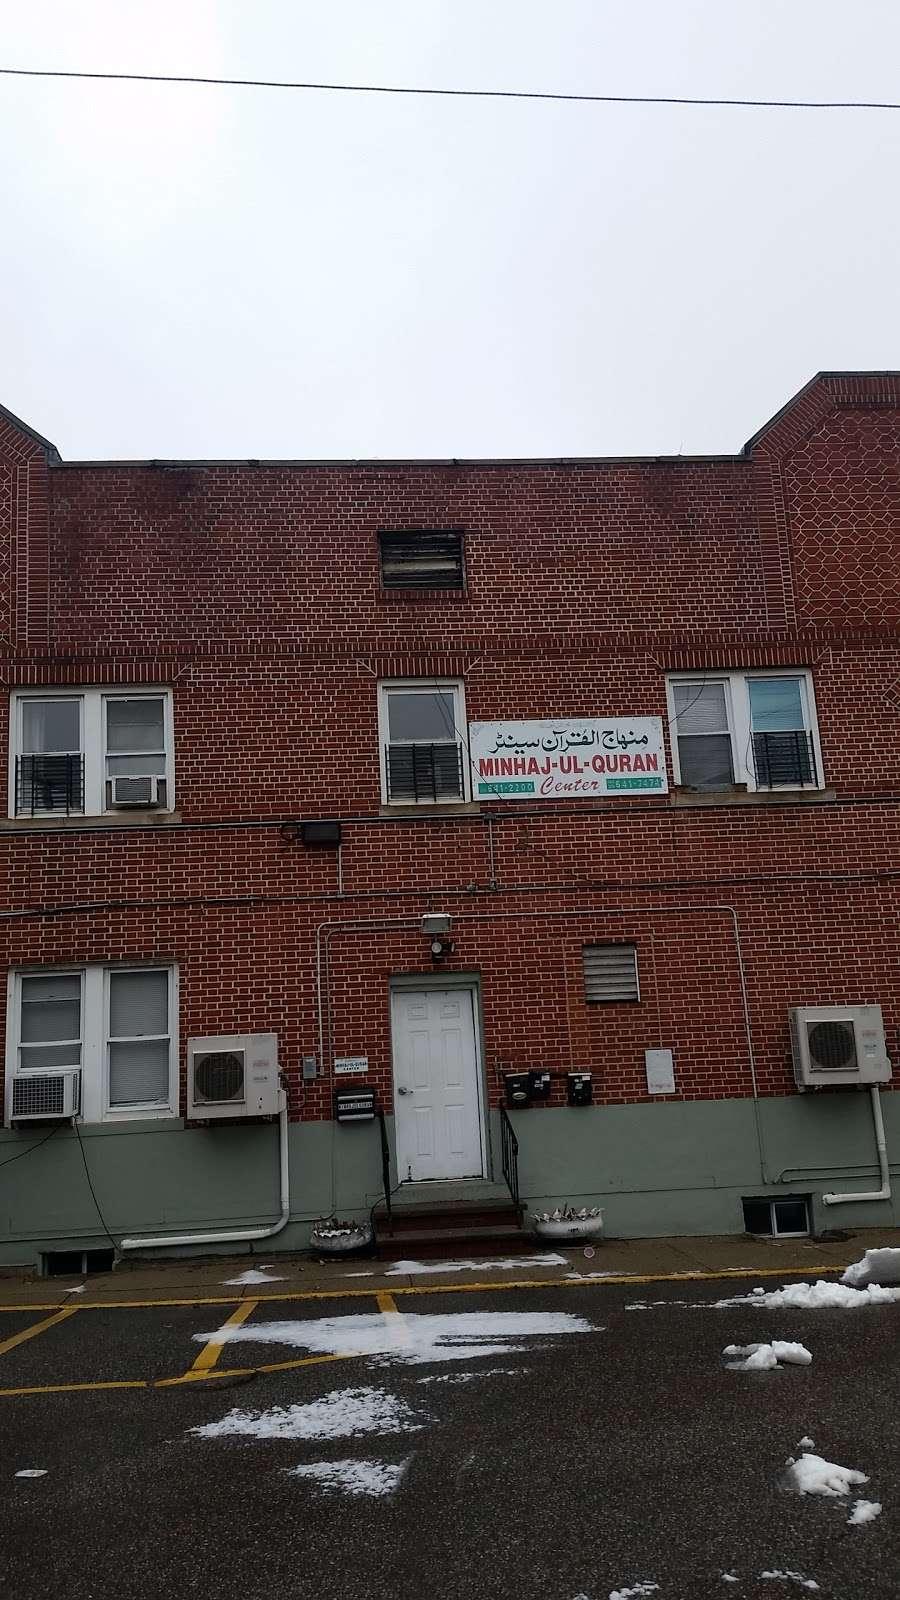 Minhaj-Ul-Quran Educational - mosque    Photo 8 of 10   Address: 36 Vreeland Ave, Hackensack, NJ 07601, USA   Phone: (201) 641-2200